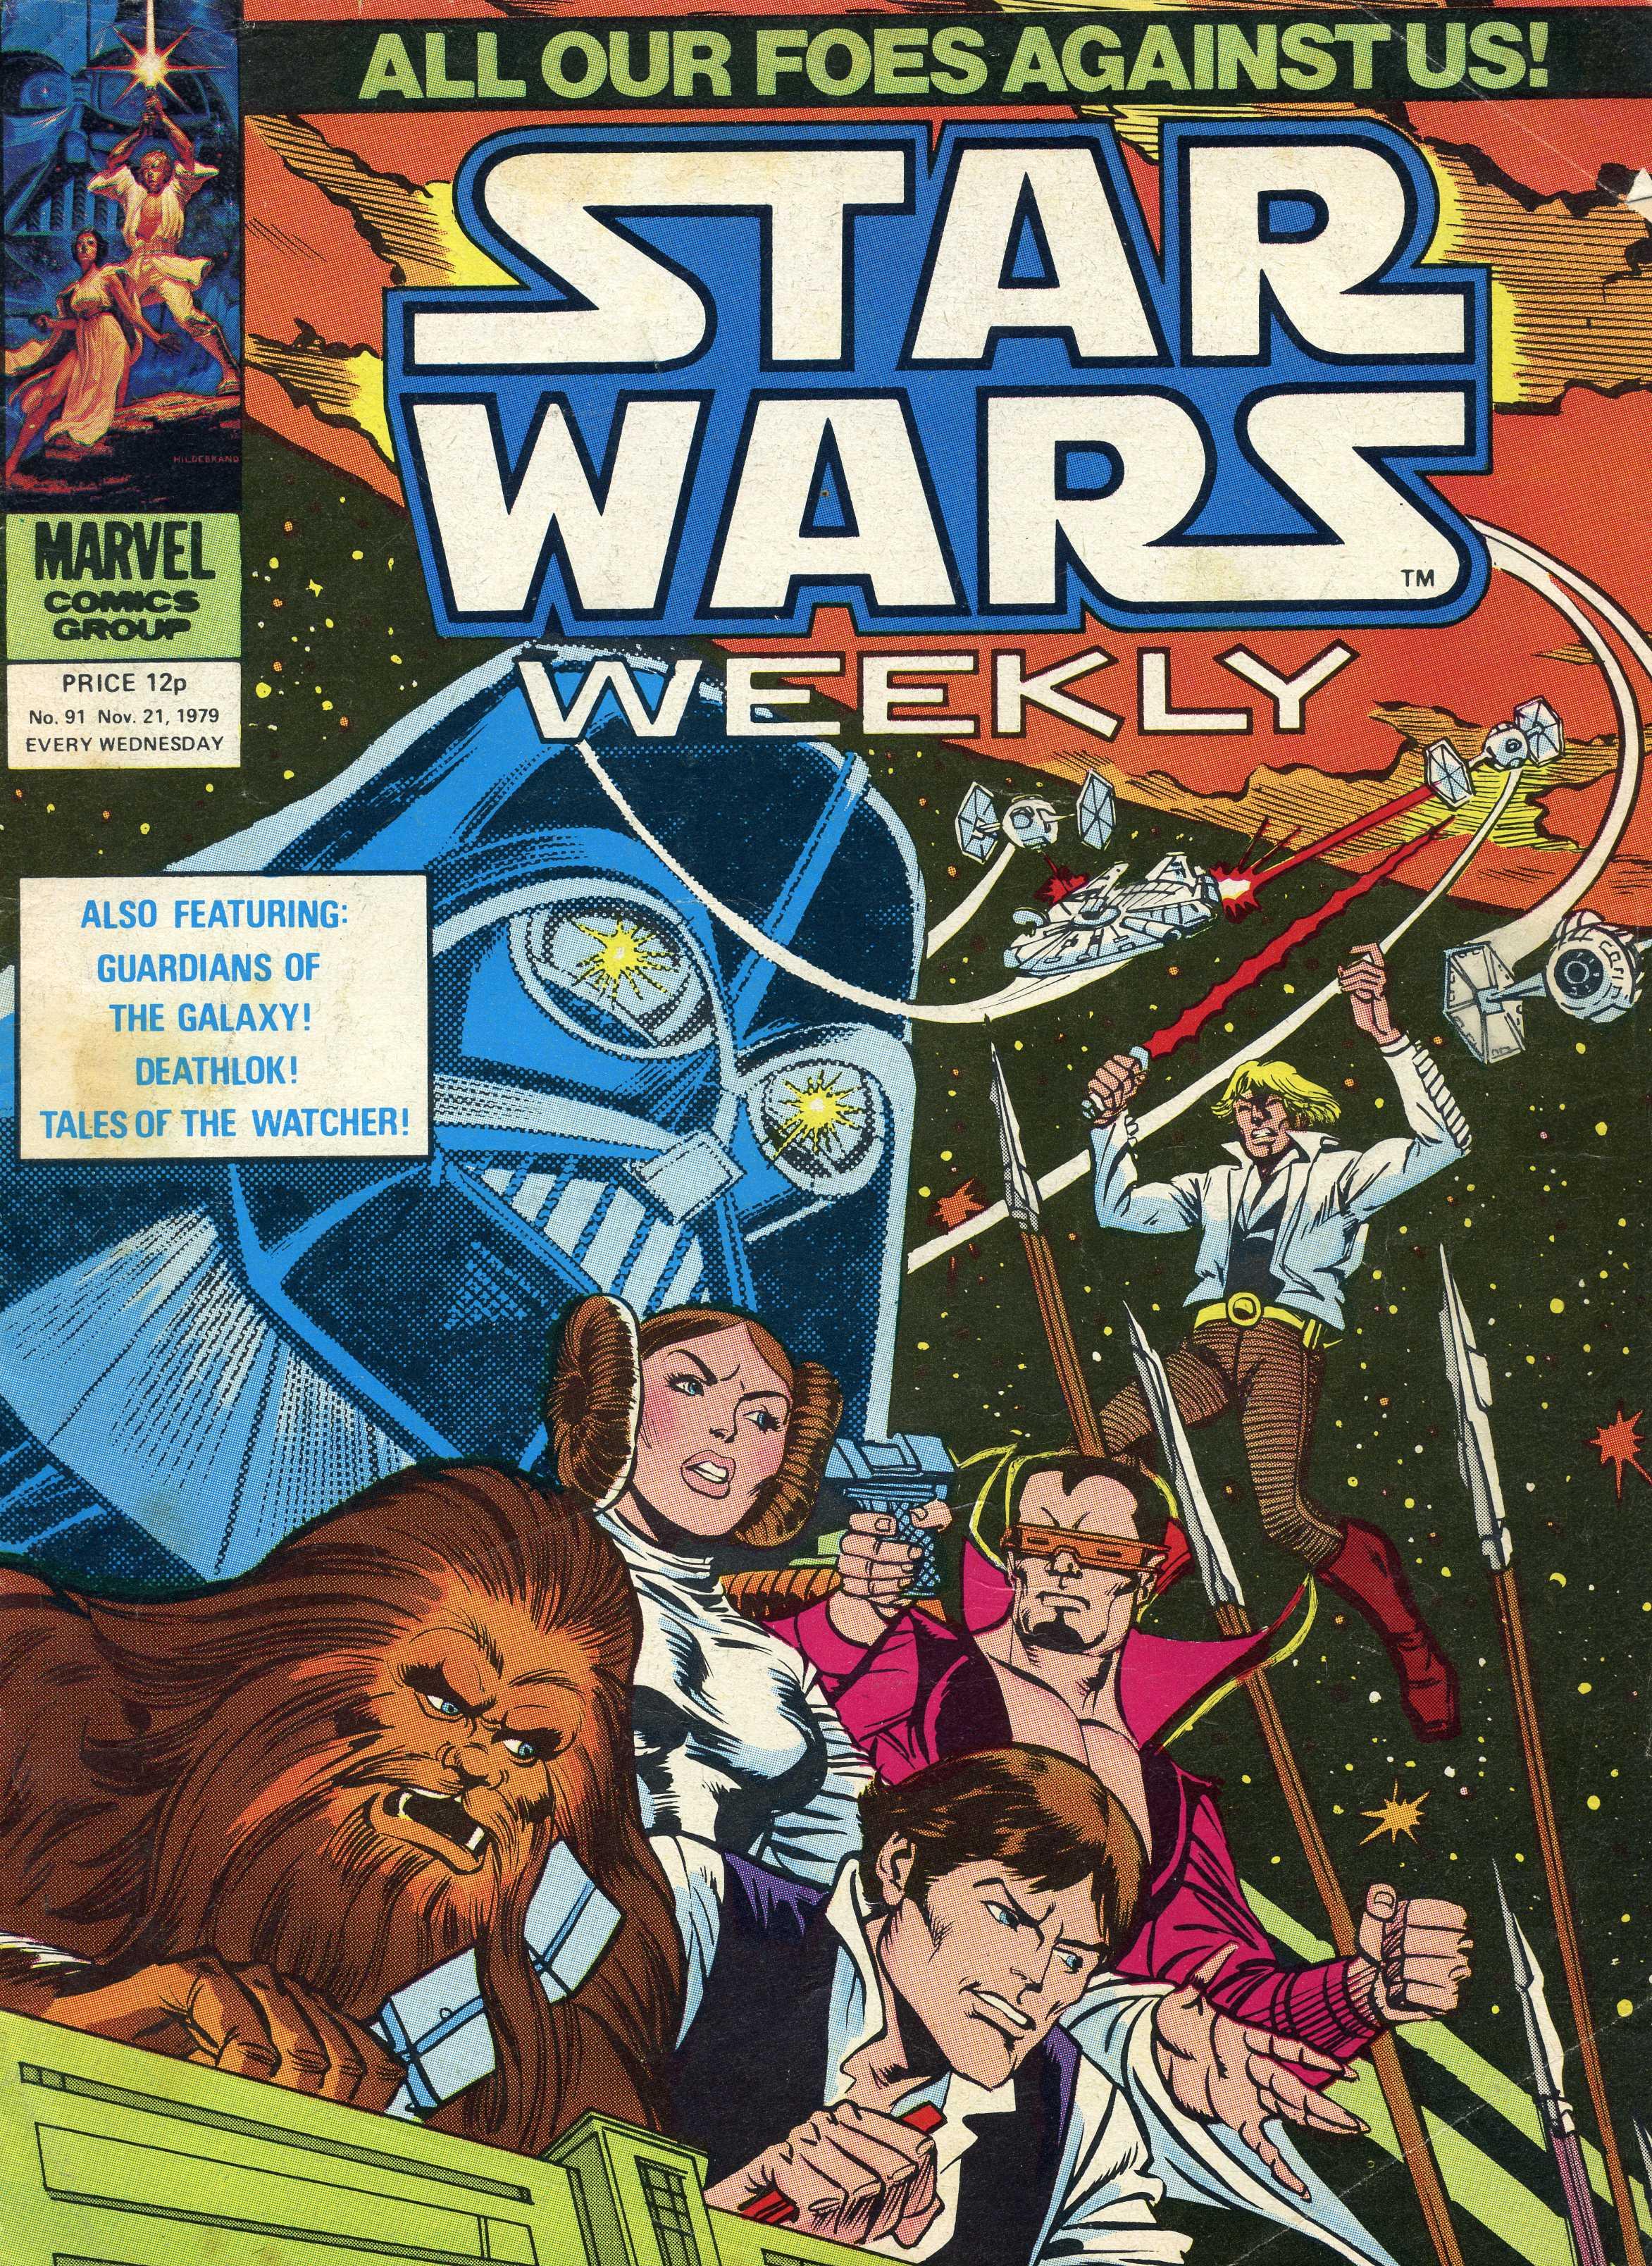 Star Wars Weekly 91